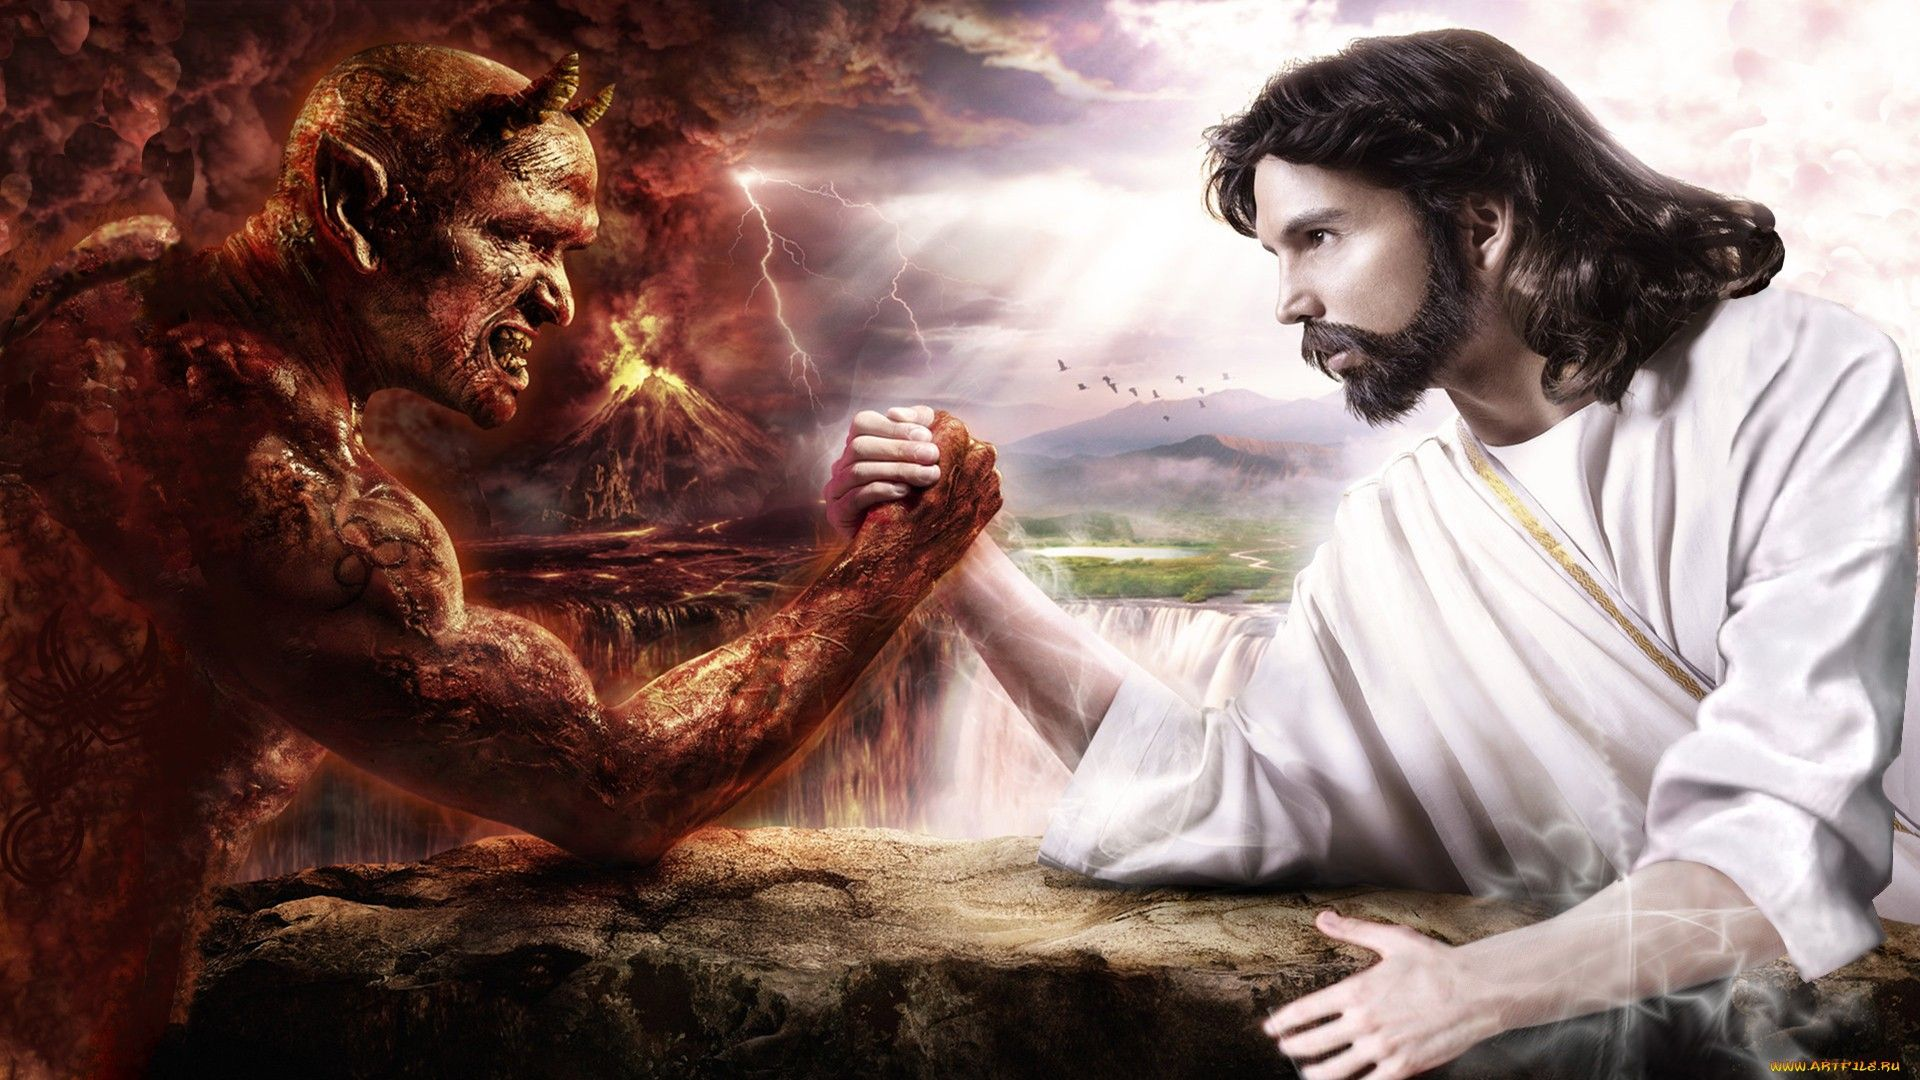 Иисус и демон картинка